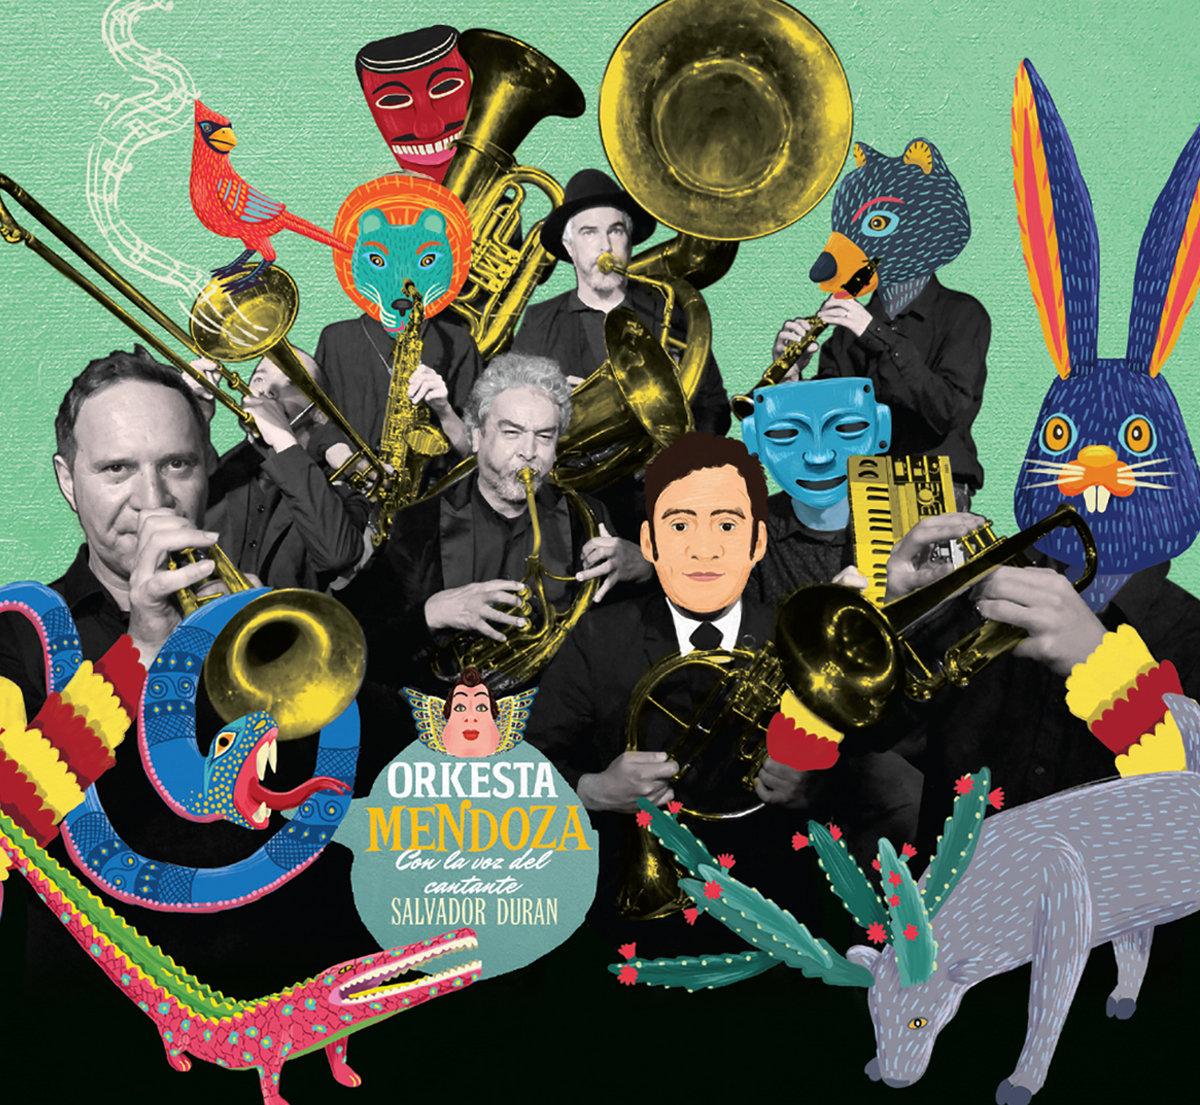 Image result for orkesta mendoza